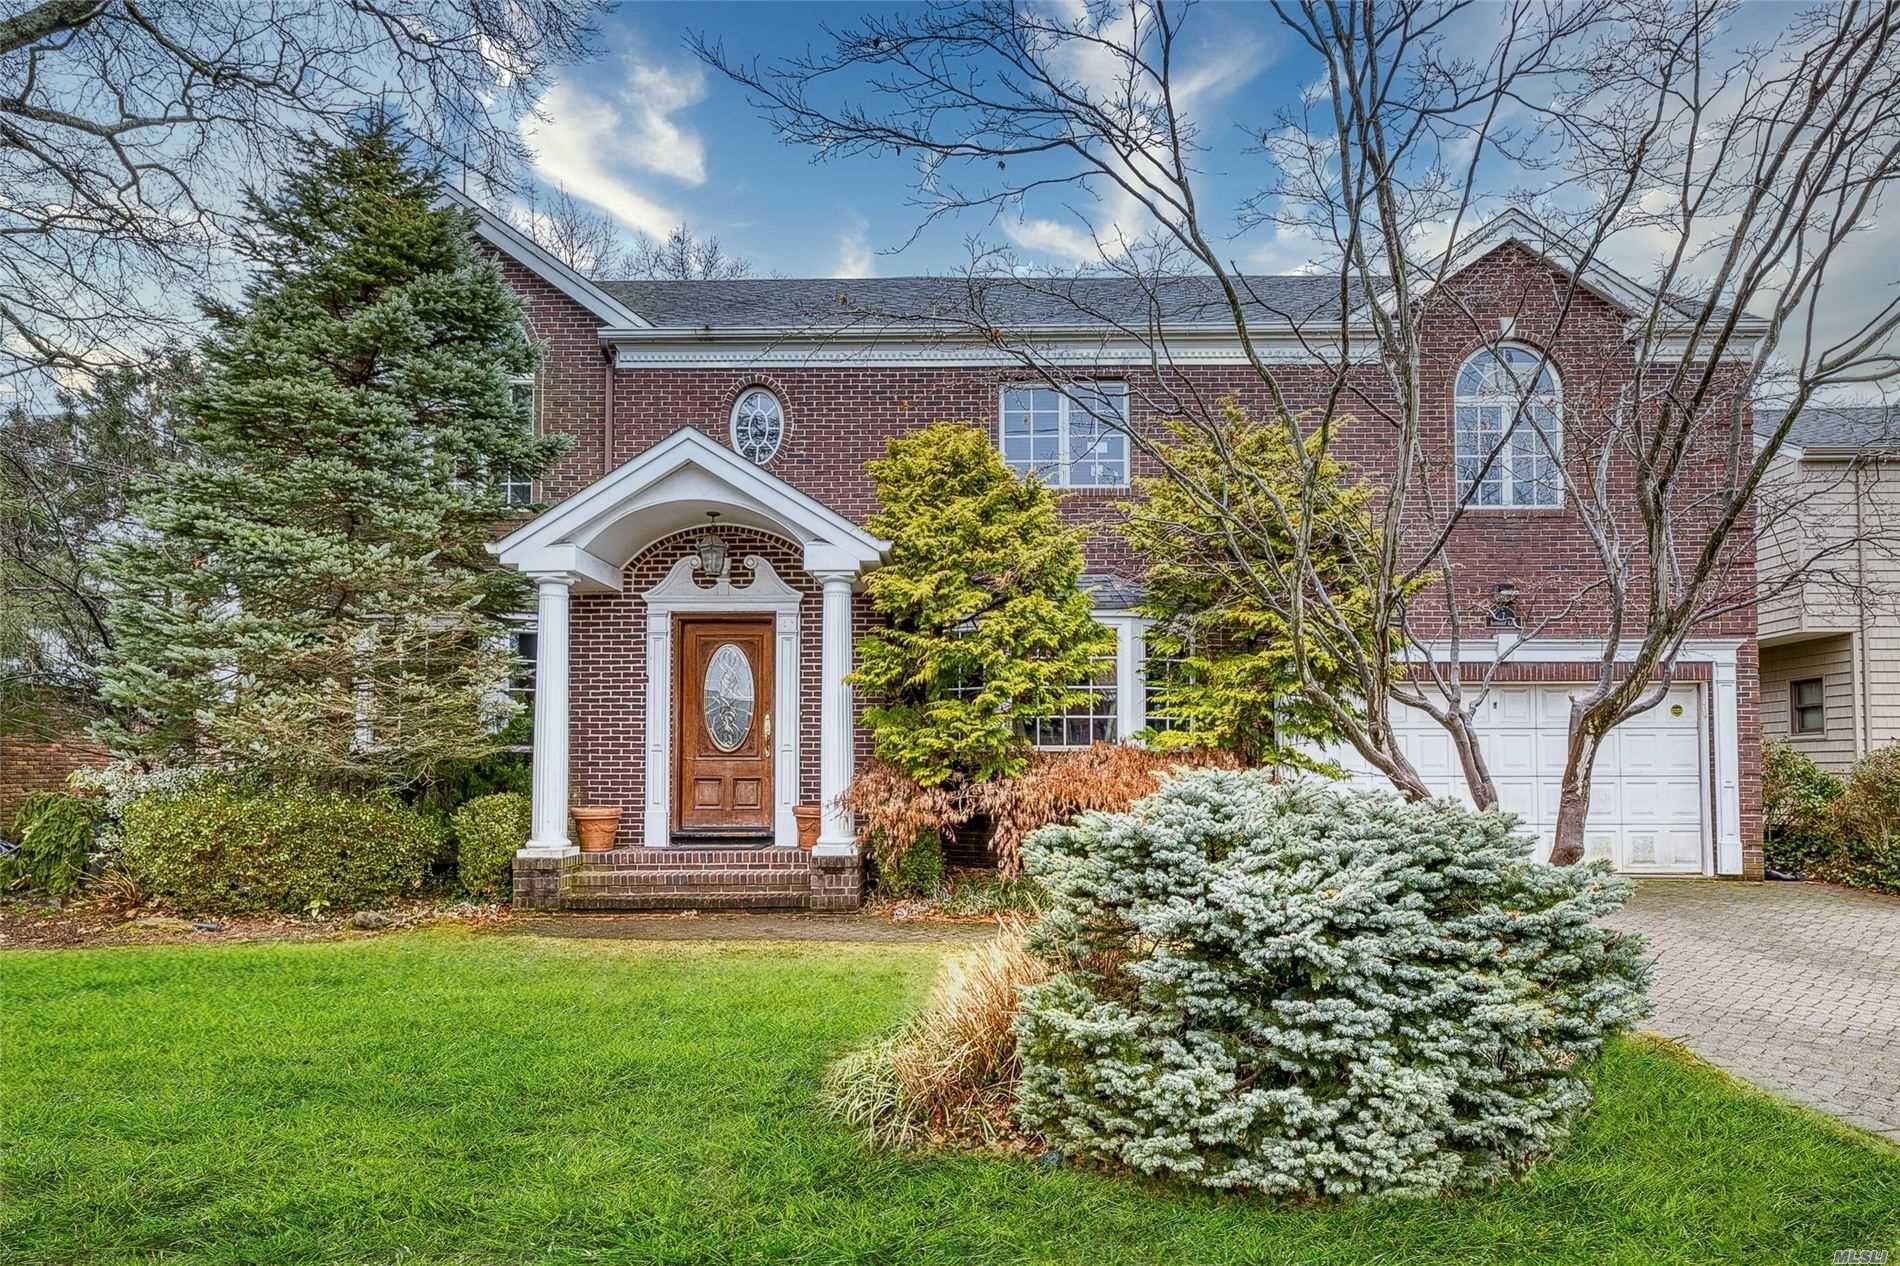 7 Auerbach Lane, Lawrence, NY 11559 - MLS#: 3216143